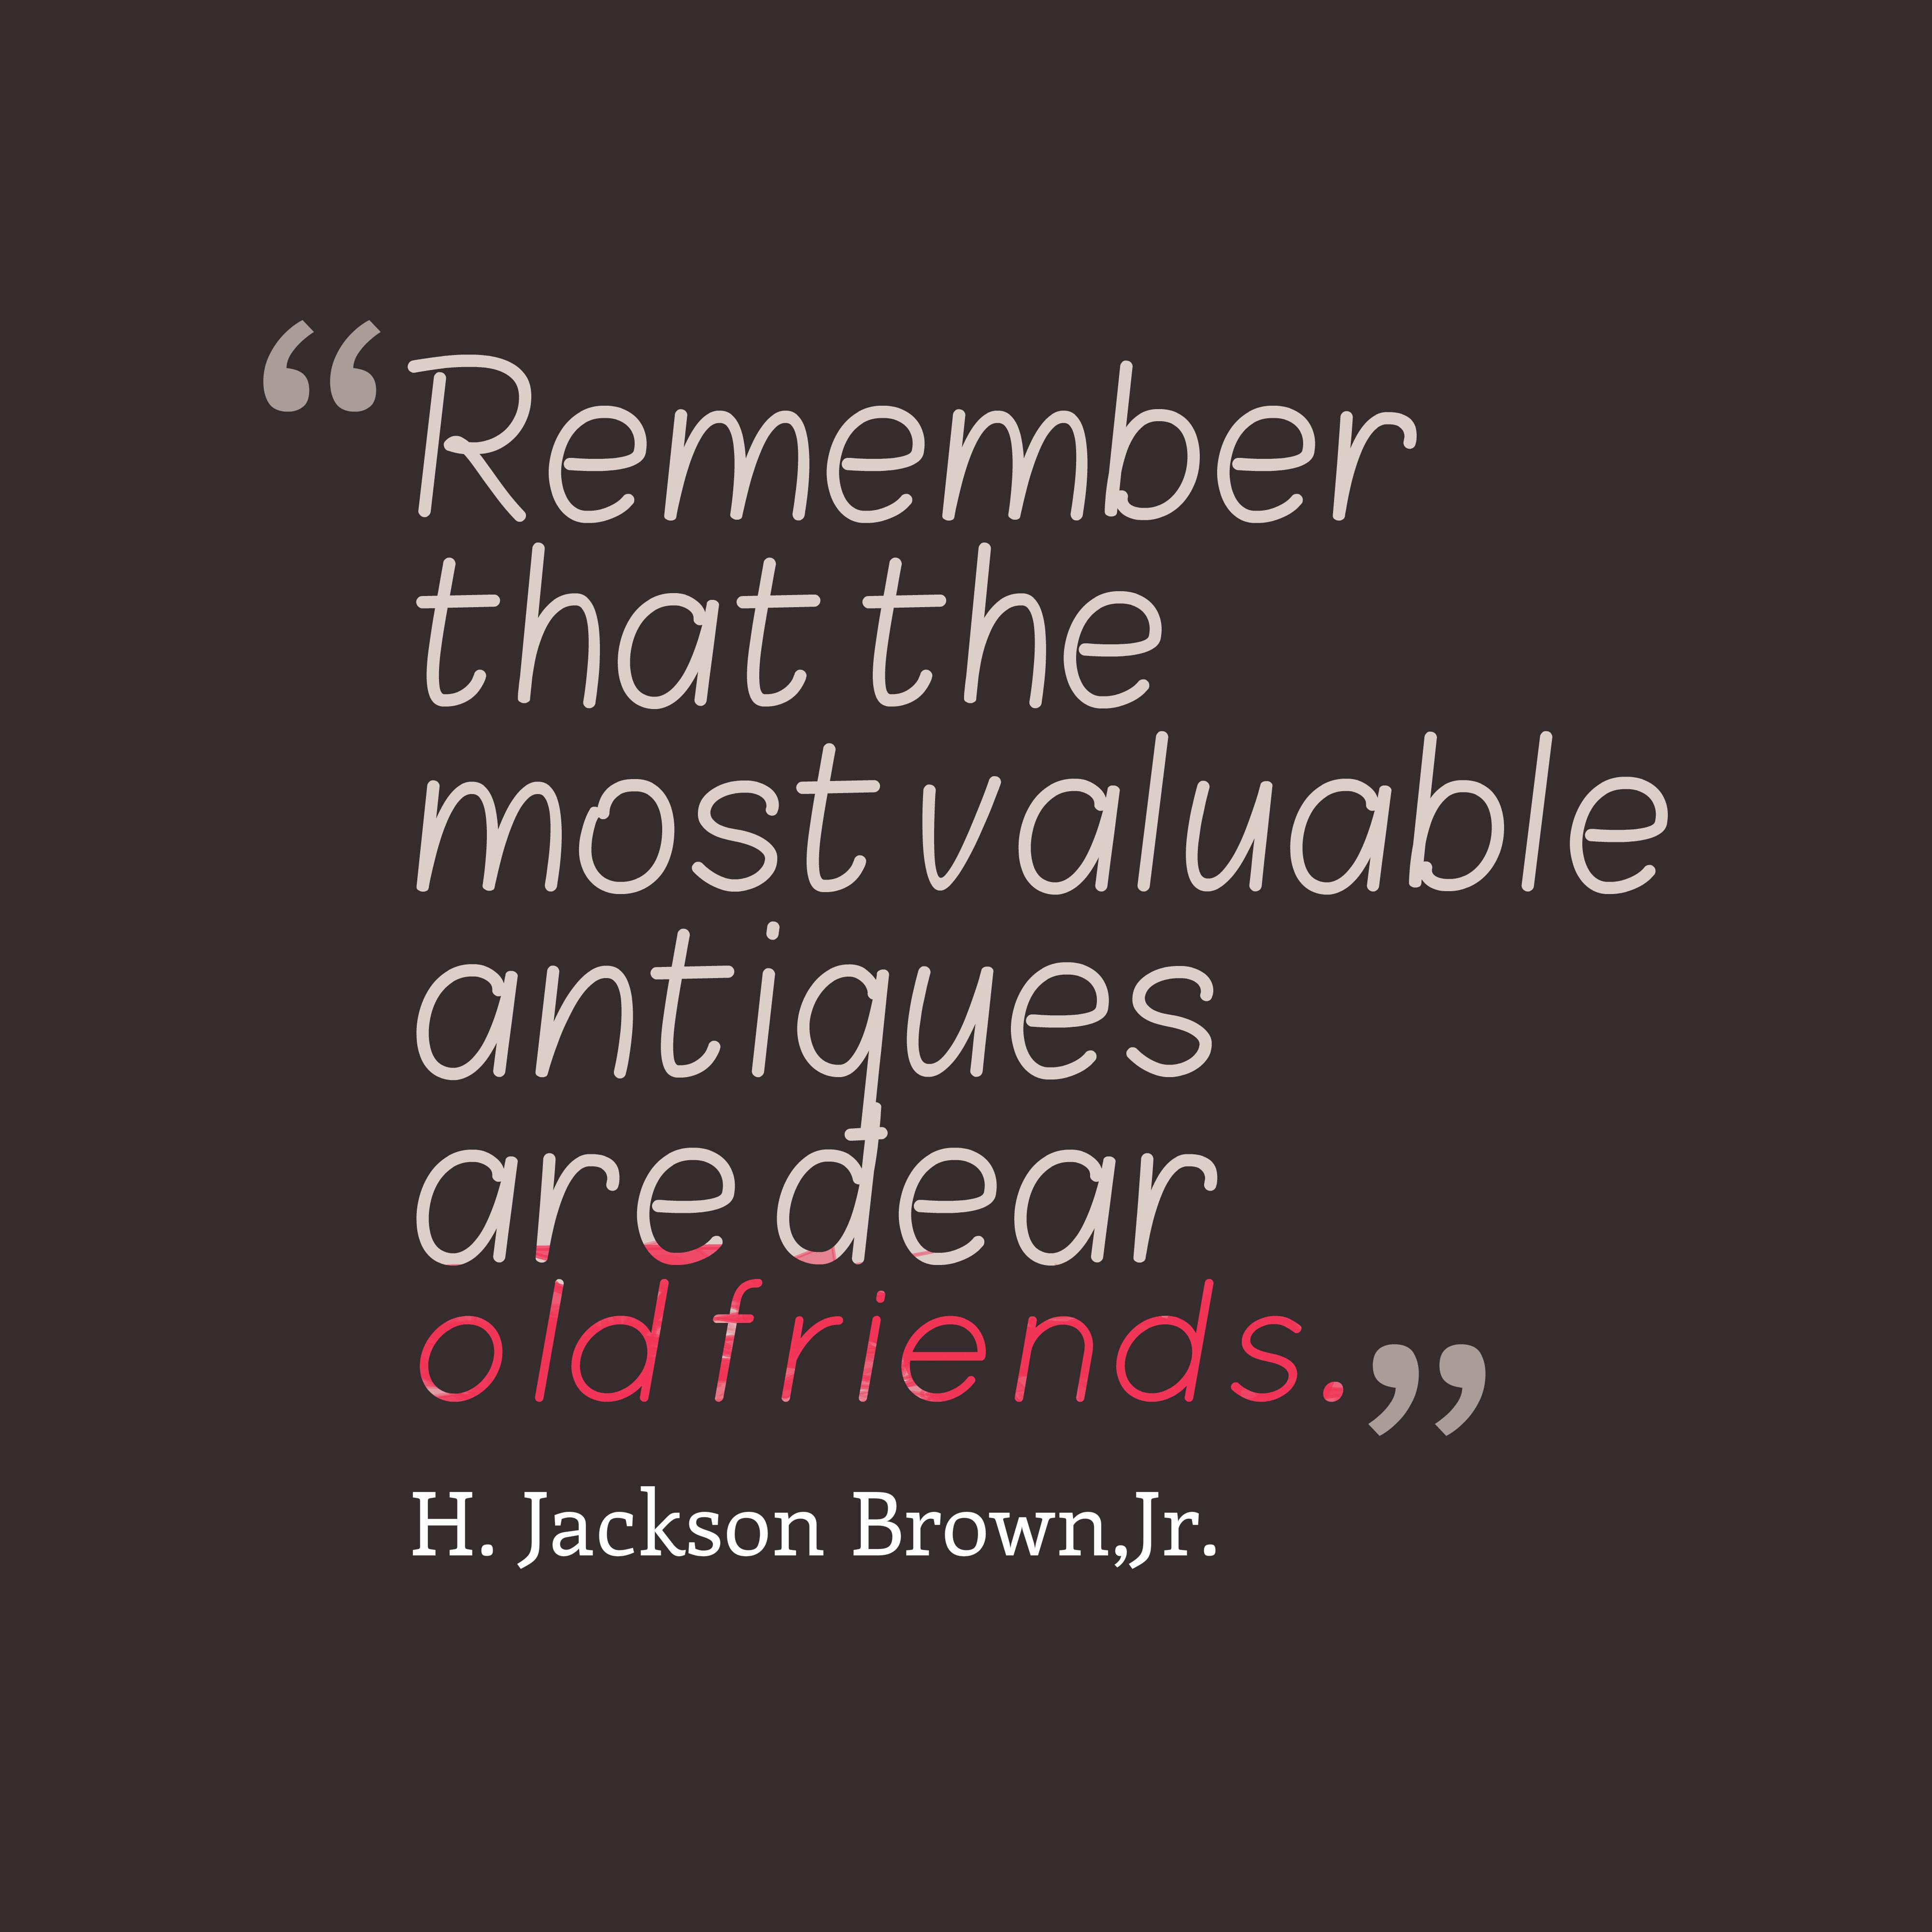 Les Brown Quotes 387 Best Les Brown Quotes Images